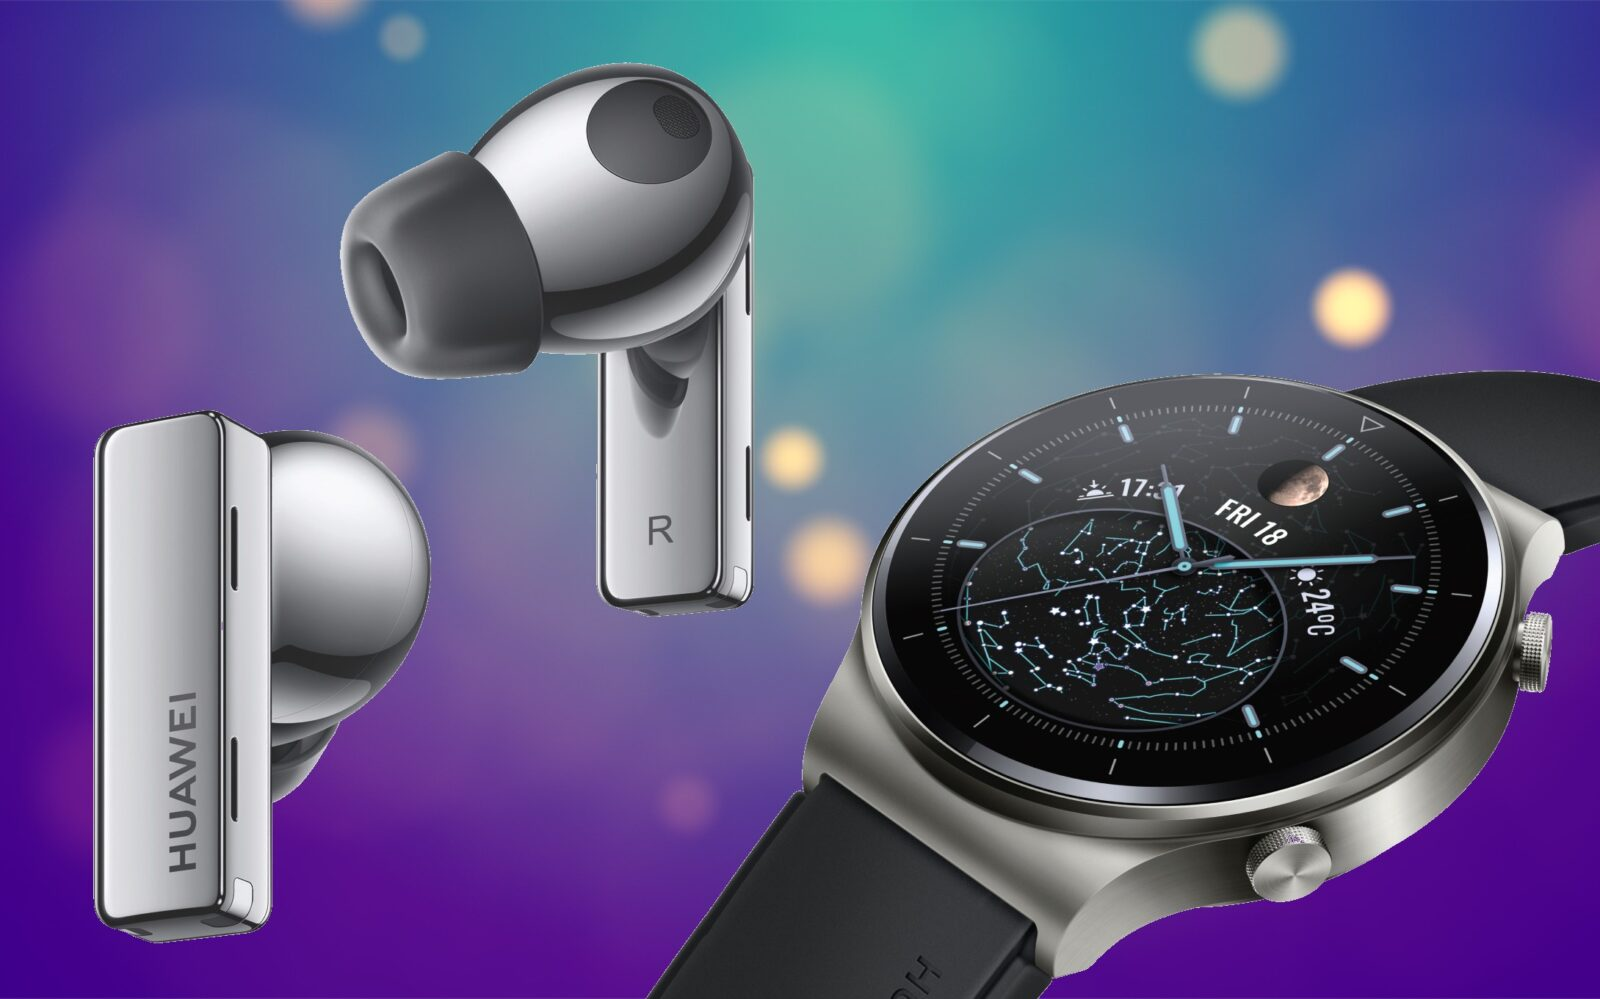 filtrados-productos-HDC-2020-Huawei